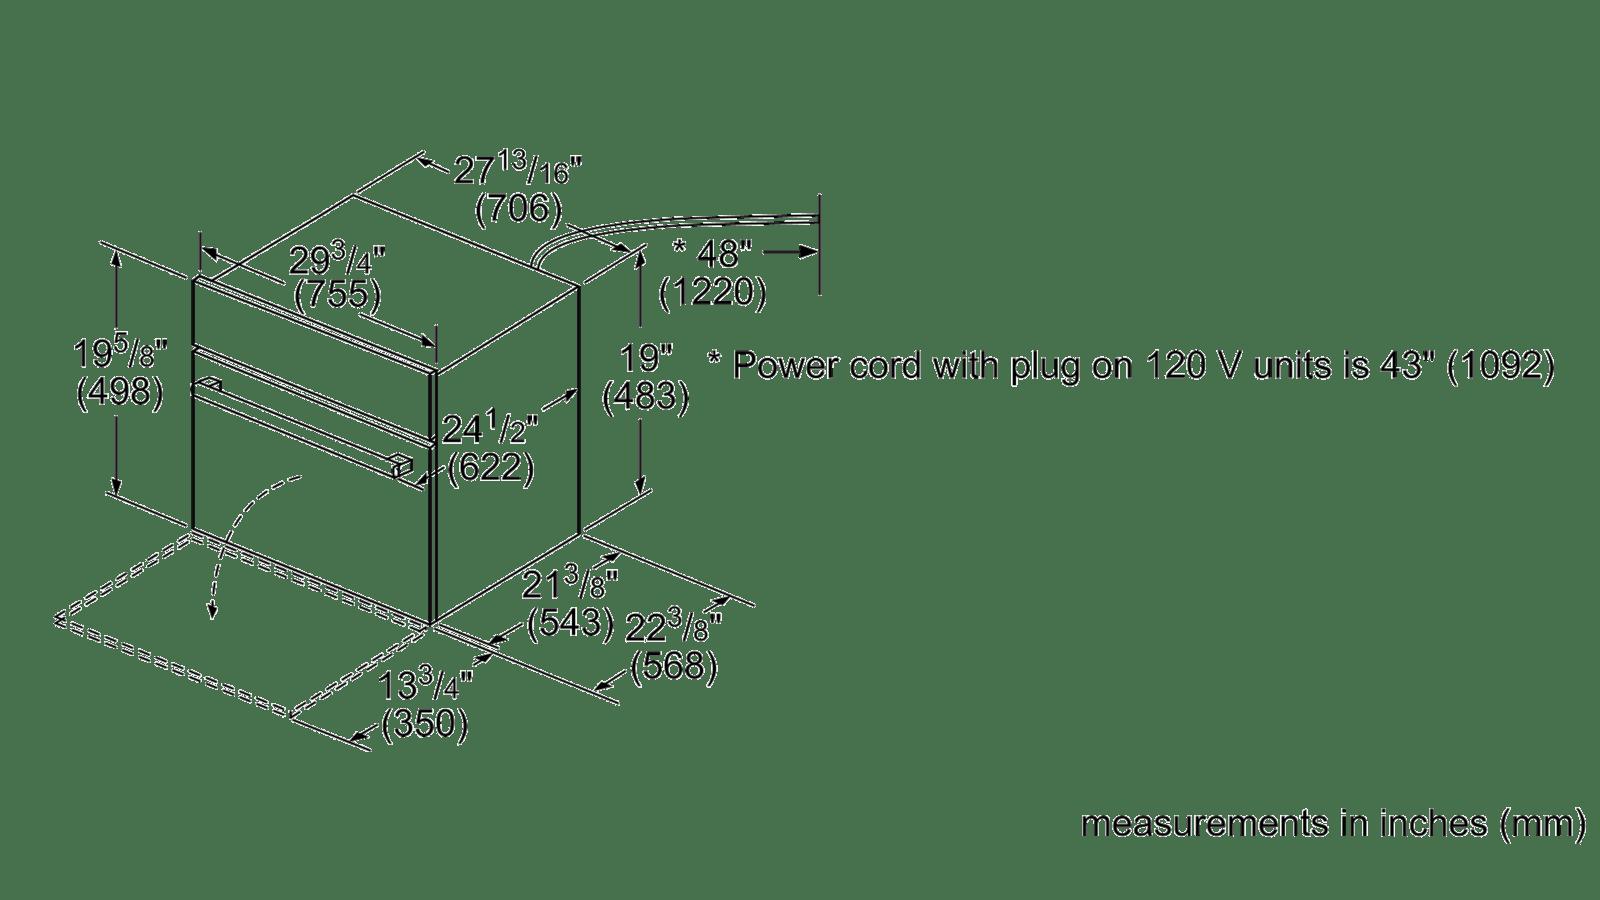 General Electric Refrigerator Parts Manual Wiring Diagram Date